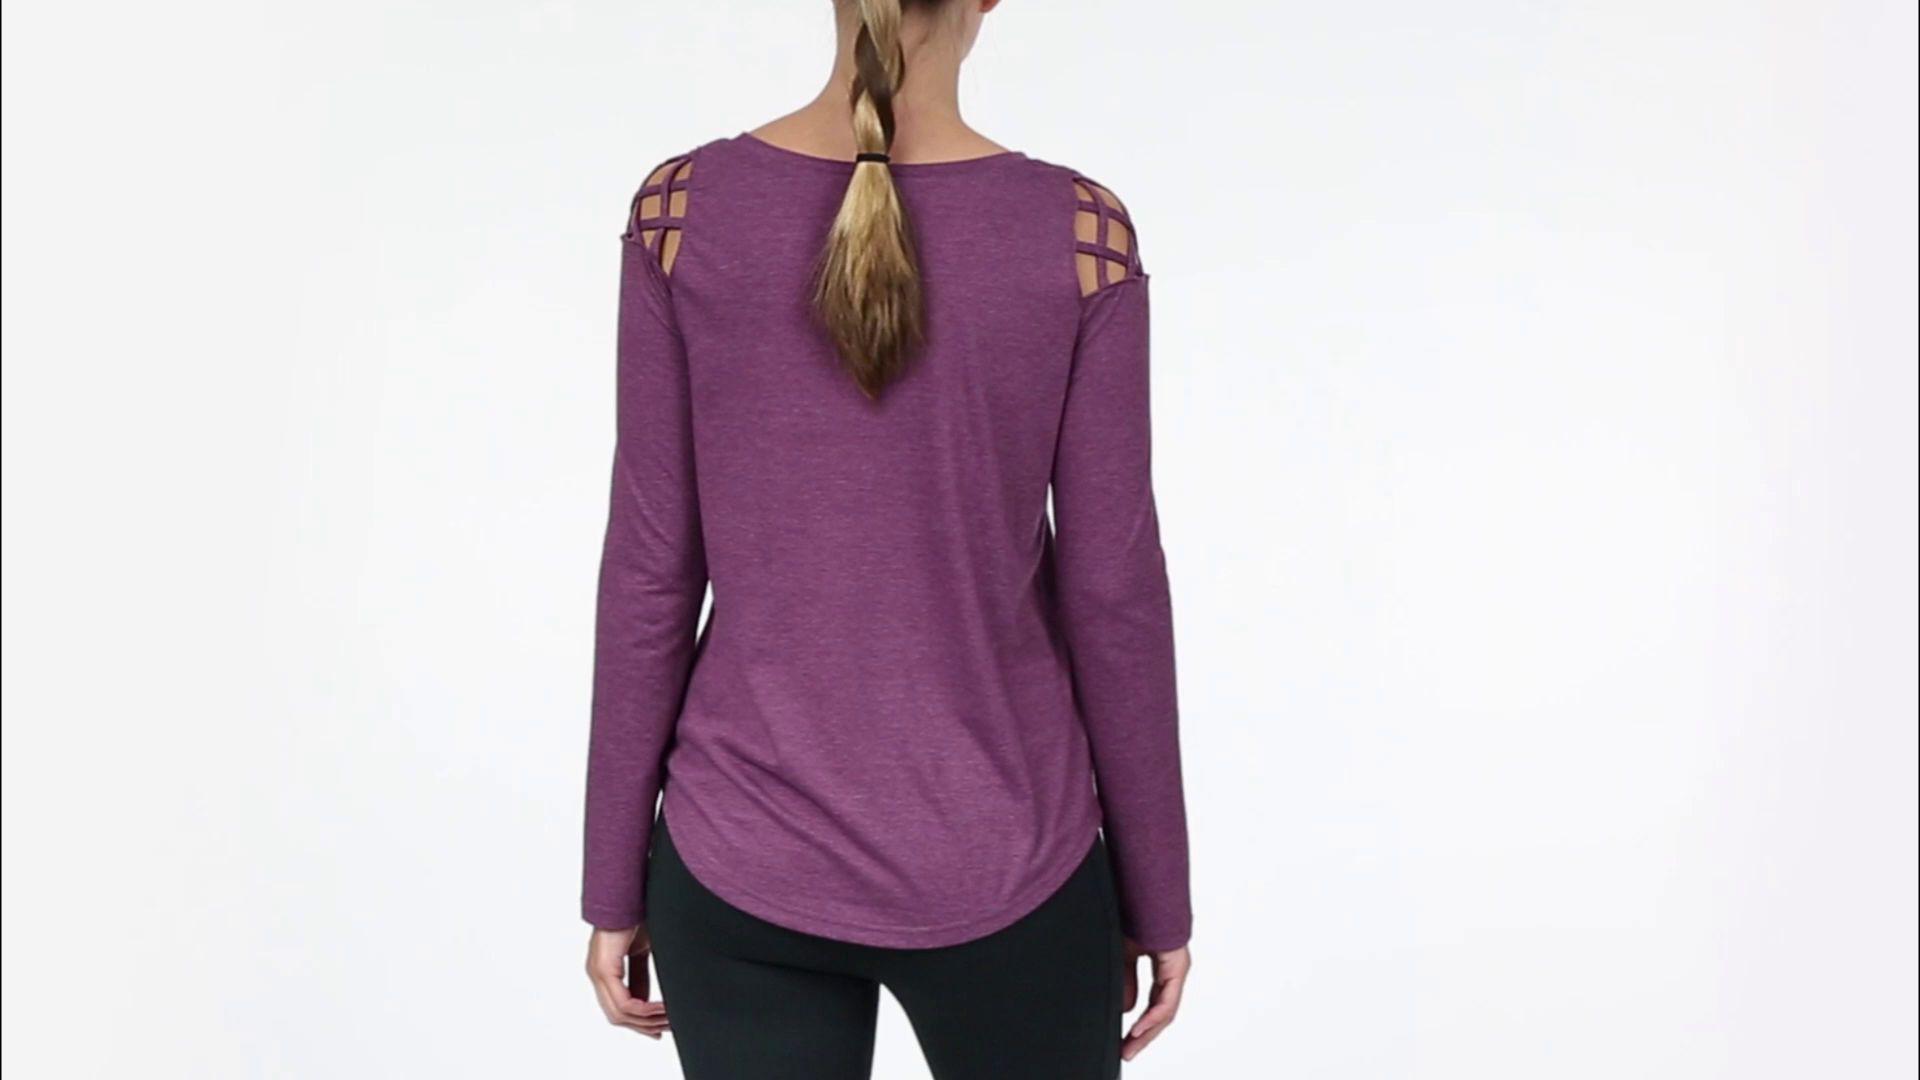 ec20563b Reebok Blue Cross Shoulder Heather Long Sleeve Shirt